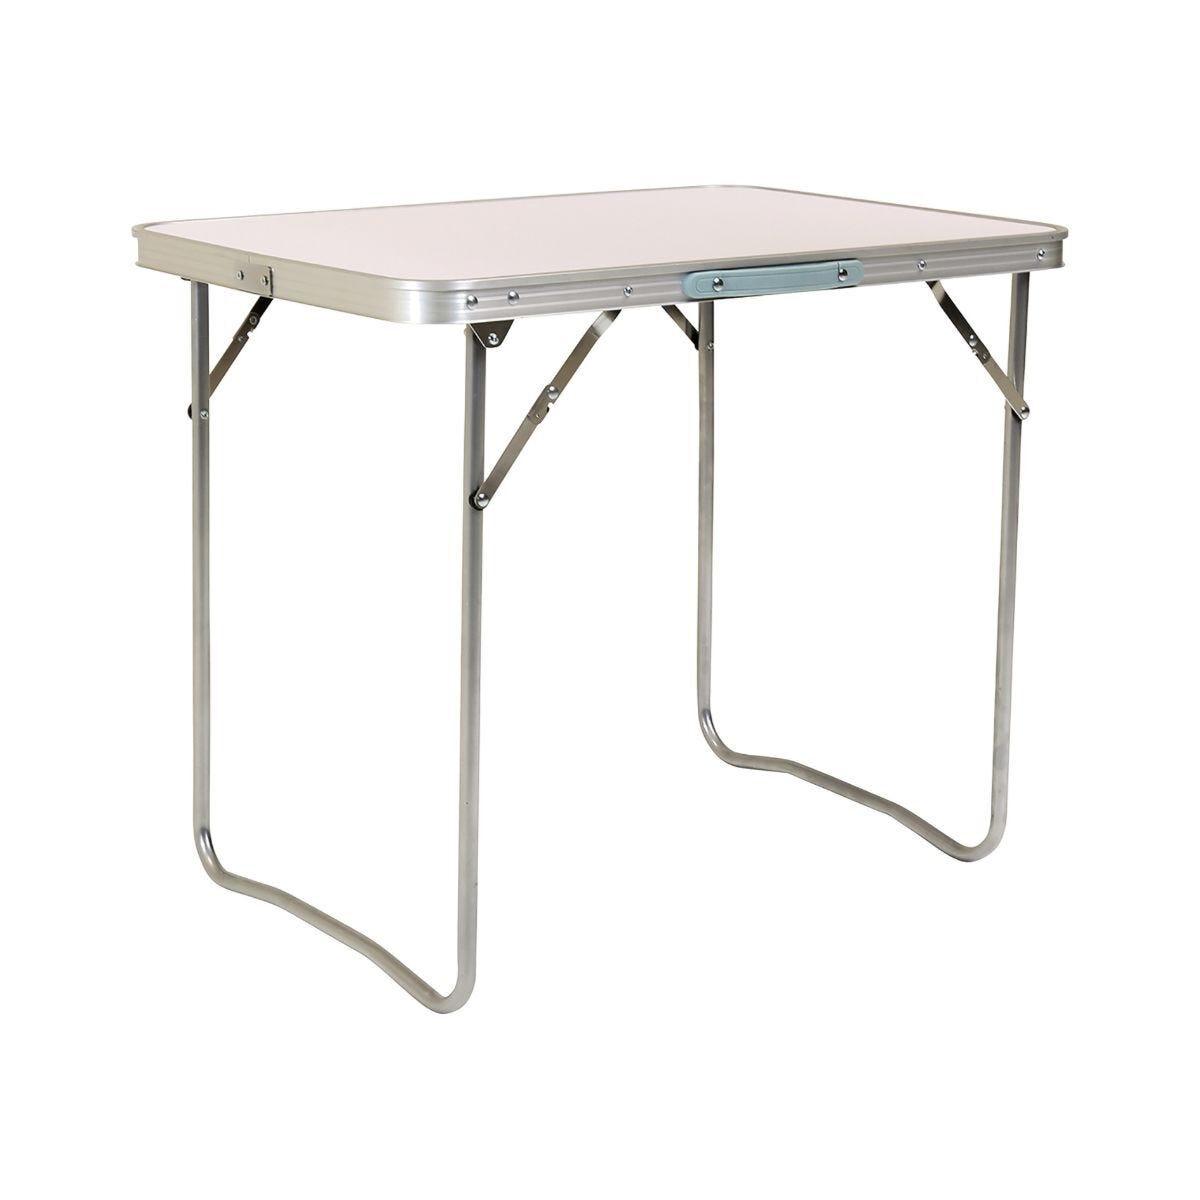 Charles Bentley Small Folding Portable Camping Table